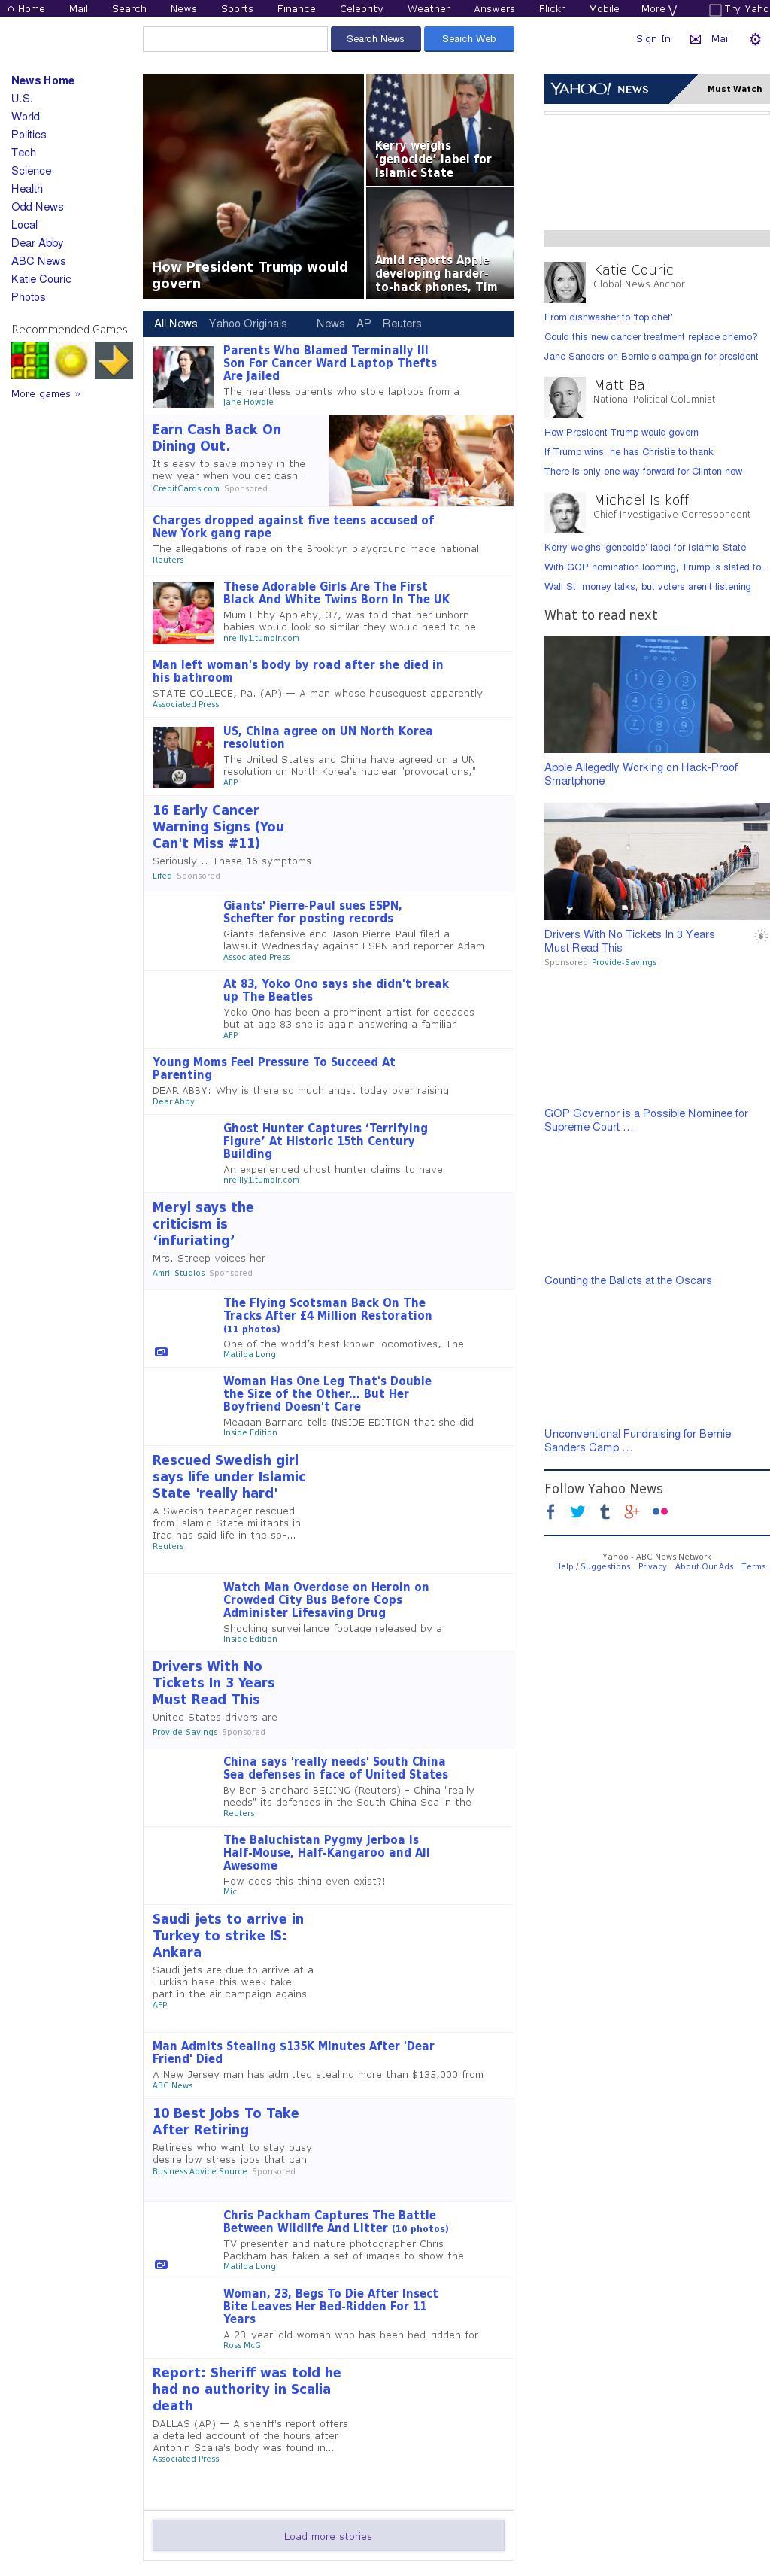 Yahoo! News at Thursday Feb. 25, 2016, 3:28 p.m. UTC